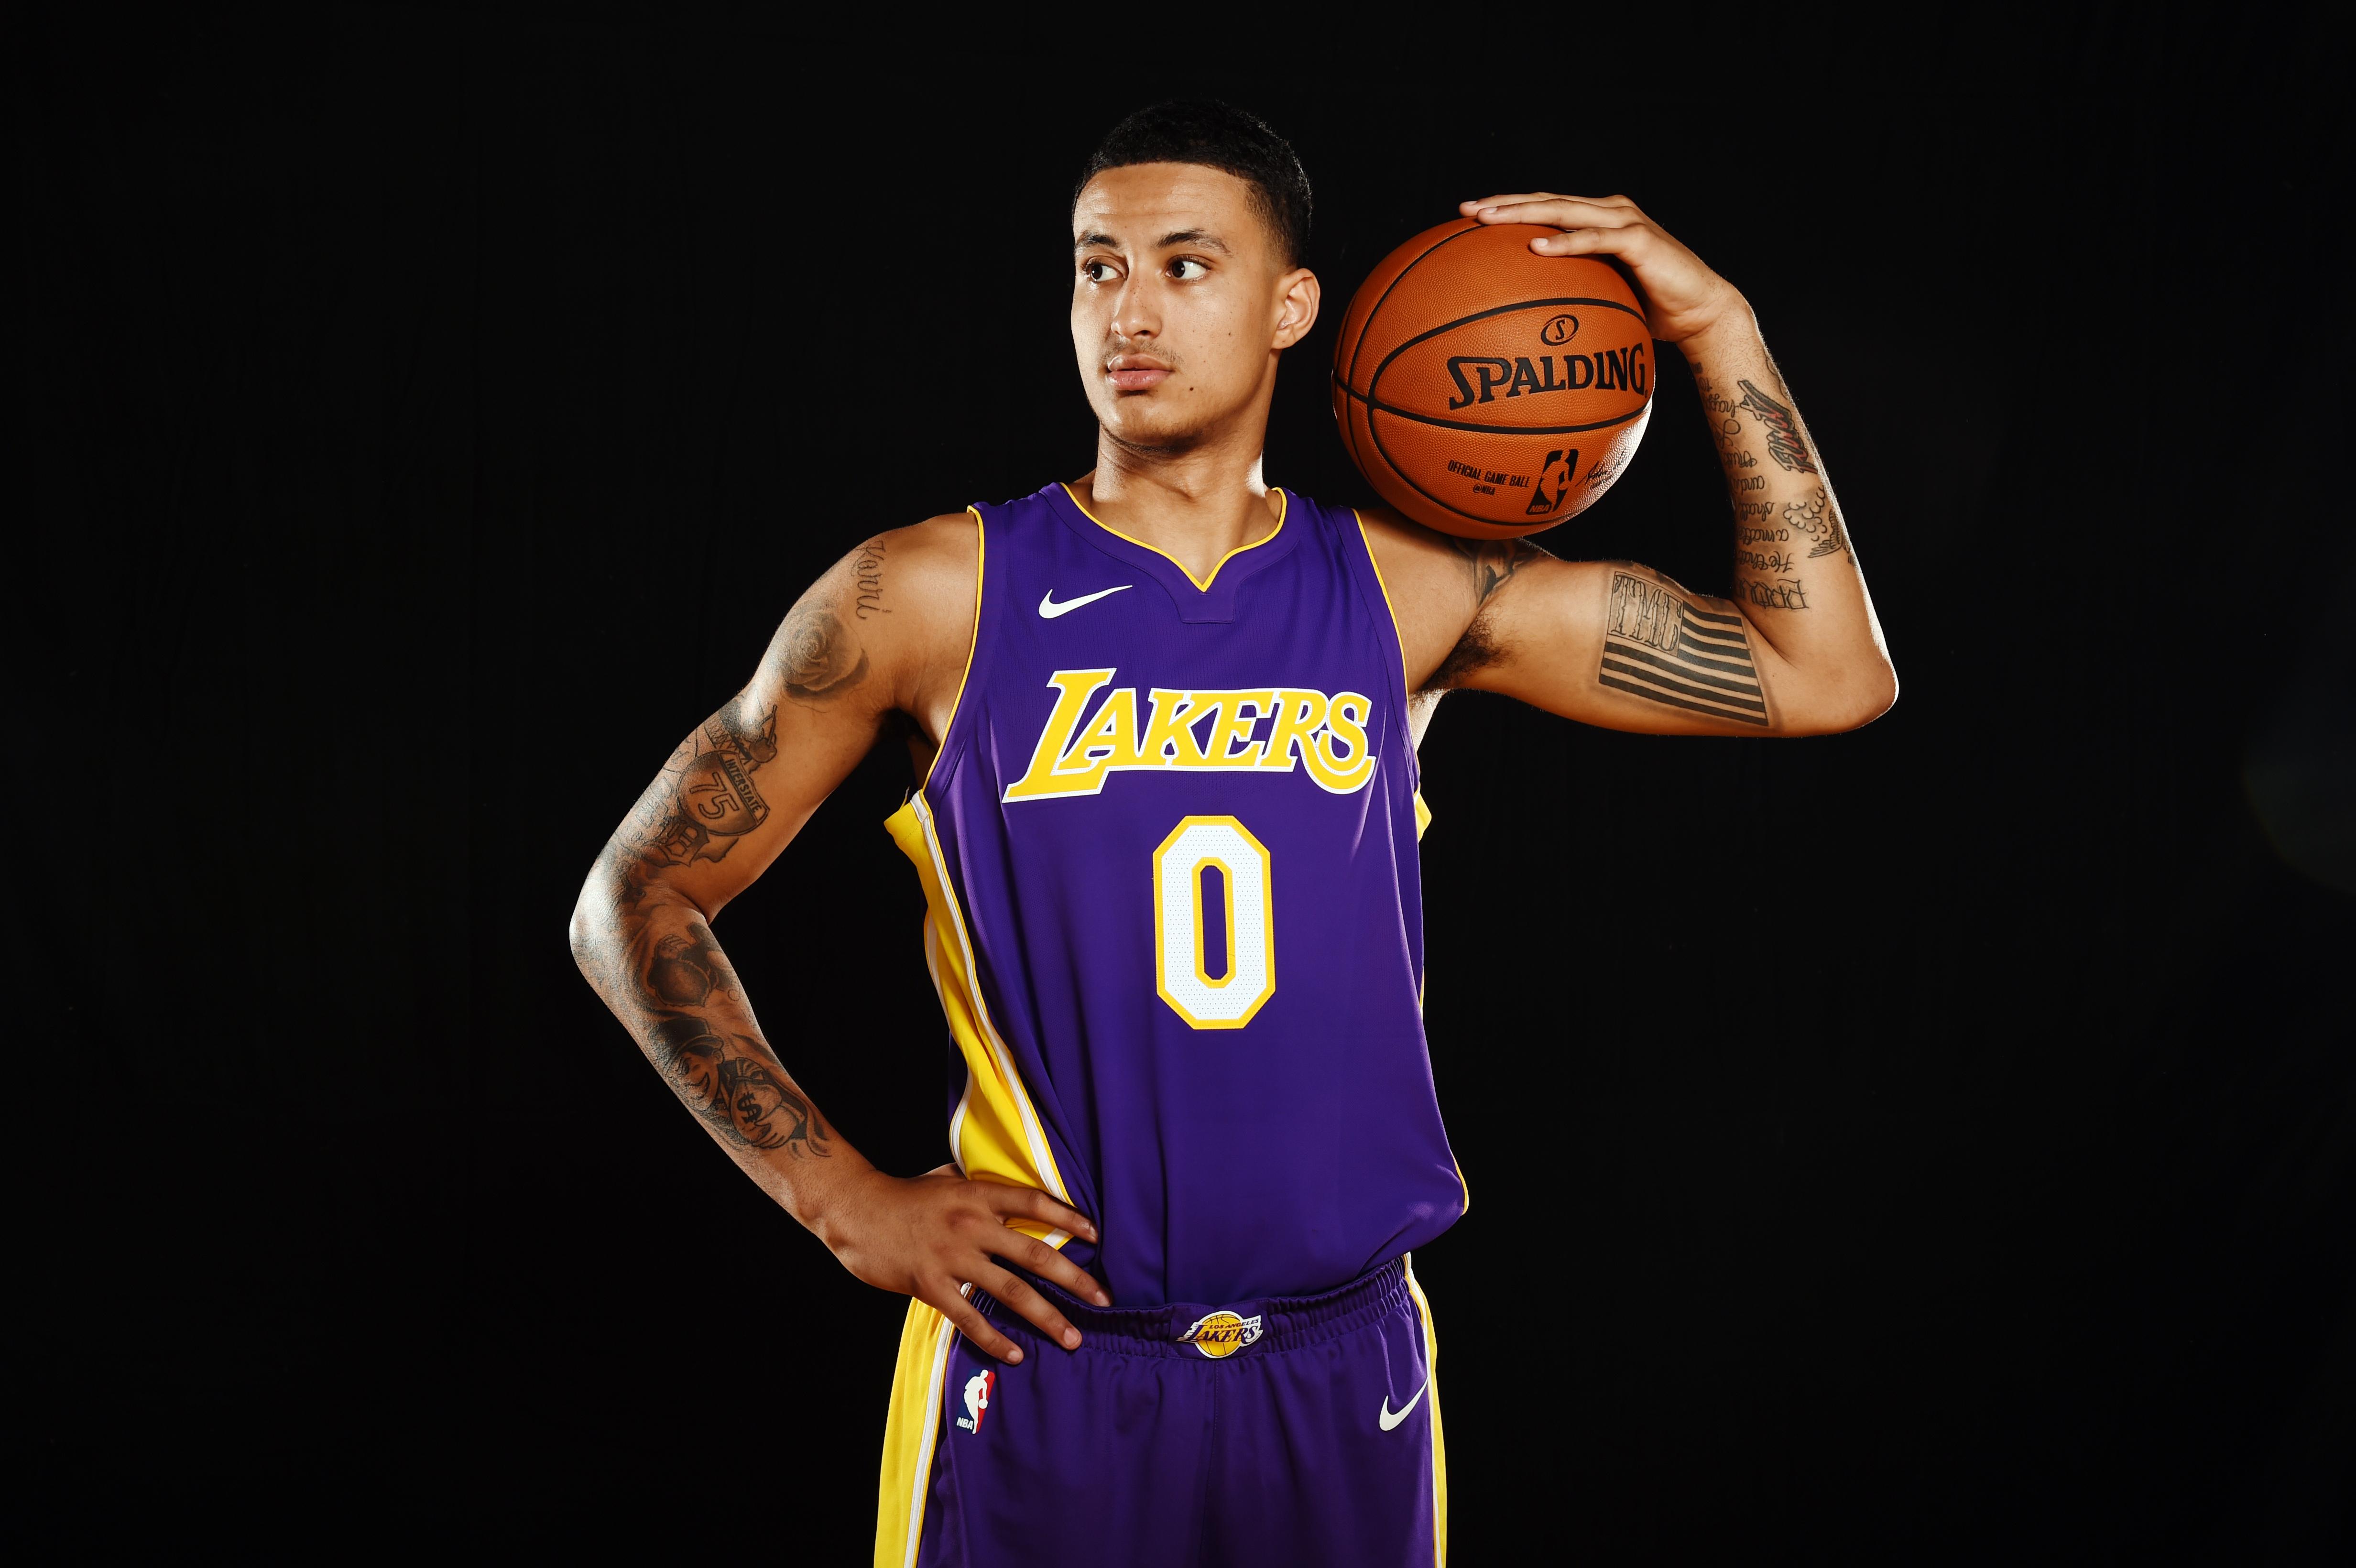 f0cbc7044e7 Lakers Rookie Kyle Kuzma on Kendrick Lamar, Kobe Bryant, Tupac ...